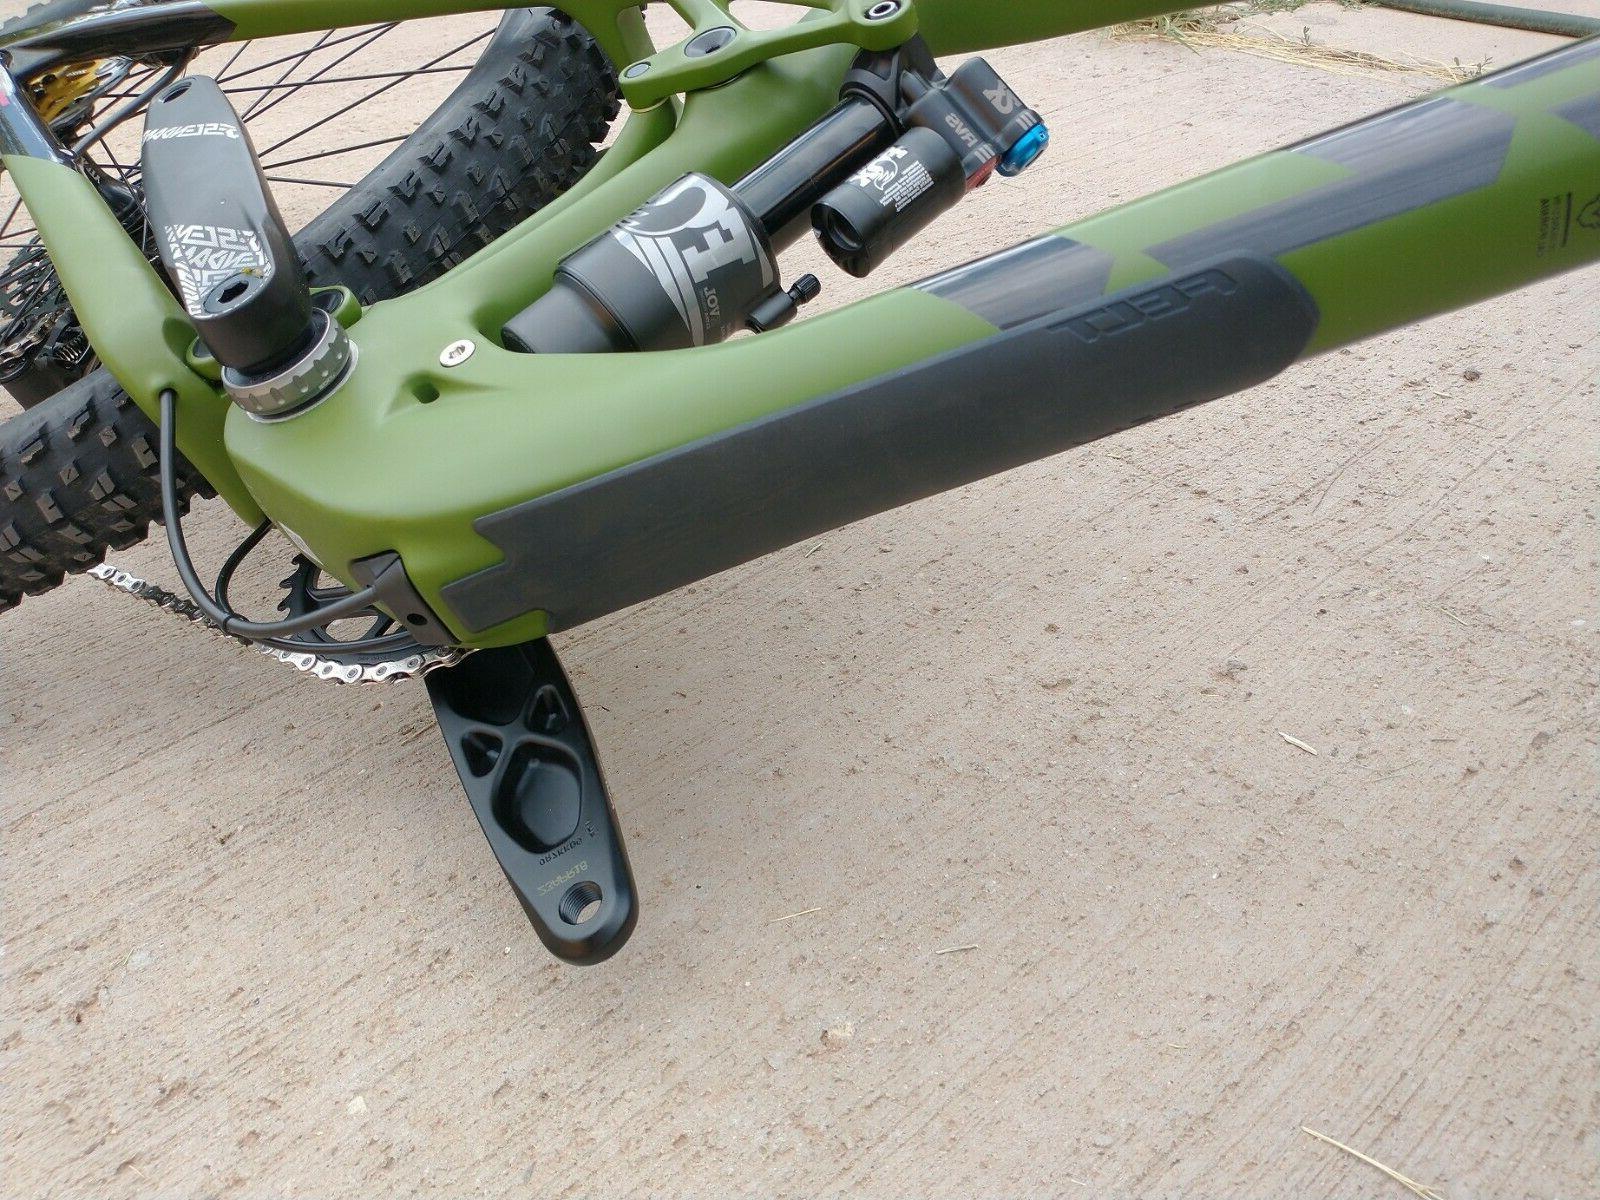 Brand New Carbon Fiber Felt Compulsion 170mm and on the